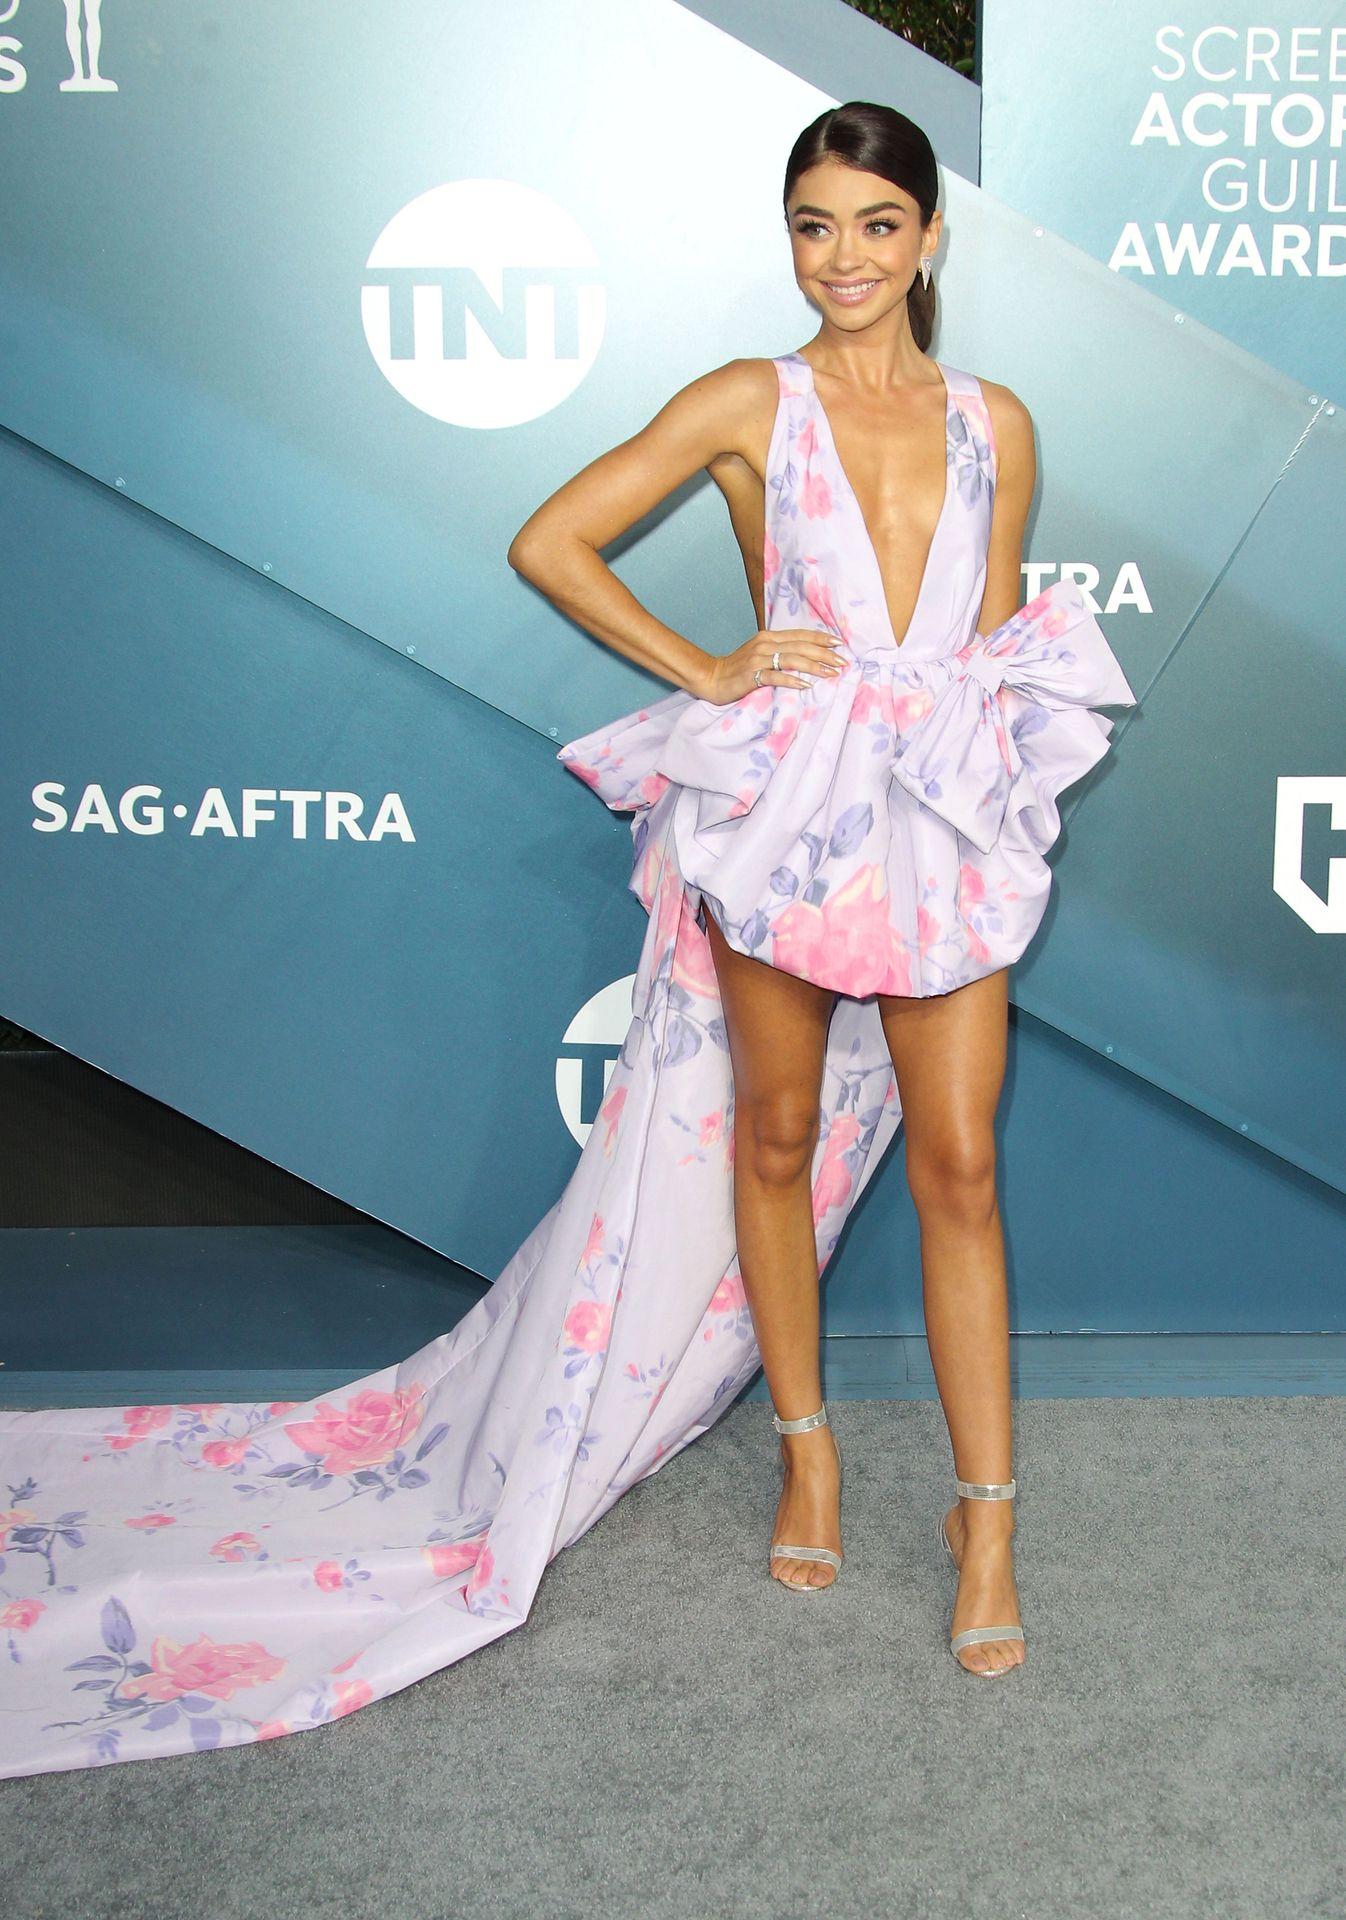 Sarah Hyland Stuns At The Screen Actors Guild Awards 0050